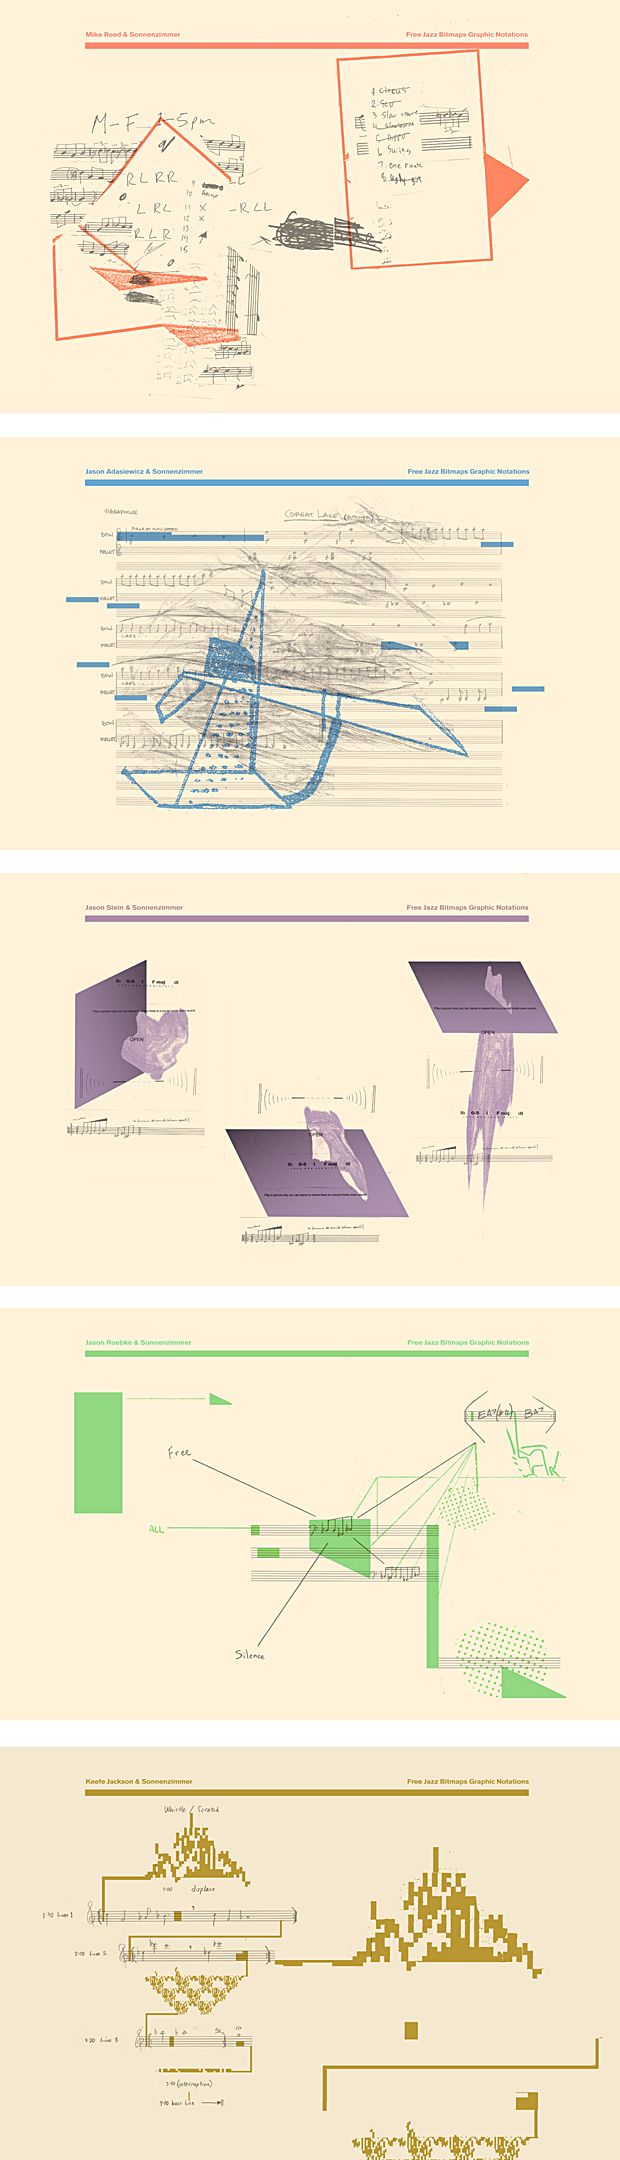 Free Jazz Bitmap. Graphic notations.  Mike Reed, Jason Stein, Jason Adasiewicz, Jason Roebke, Keefe Jackson & Sonnenzimmer